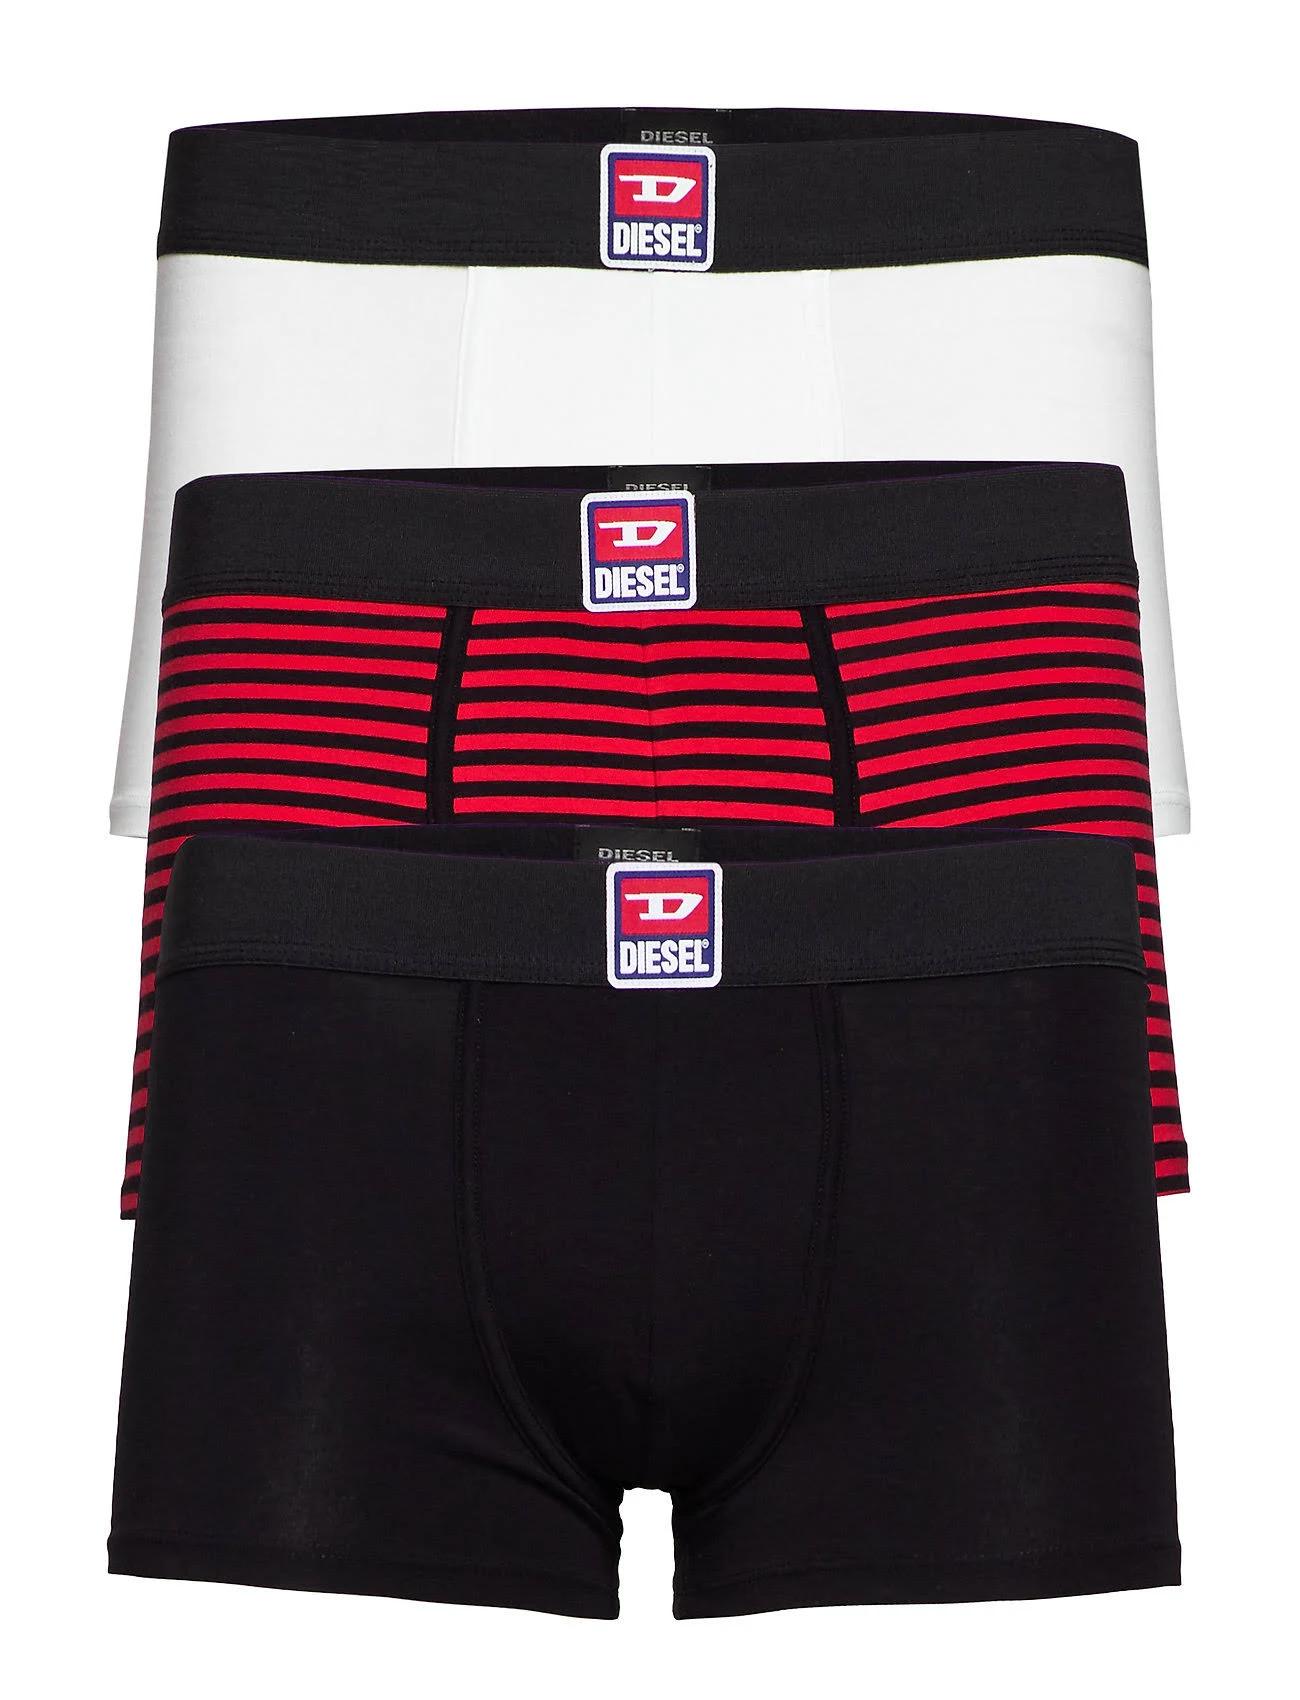 Diesel boxershorts (3-pack) maat XL voor €11,53 @ amazon.nl